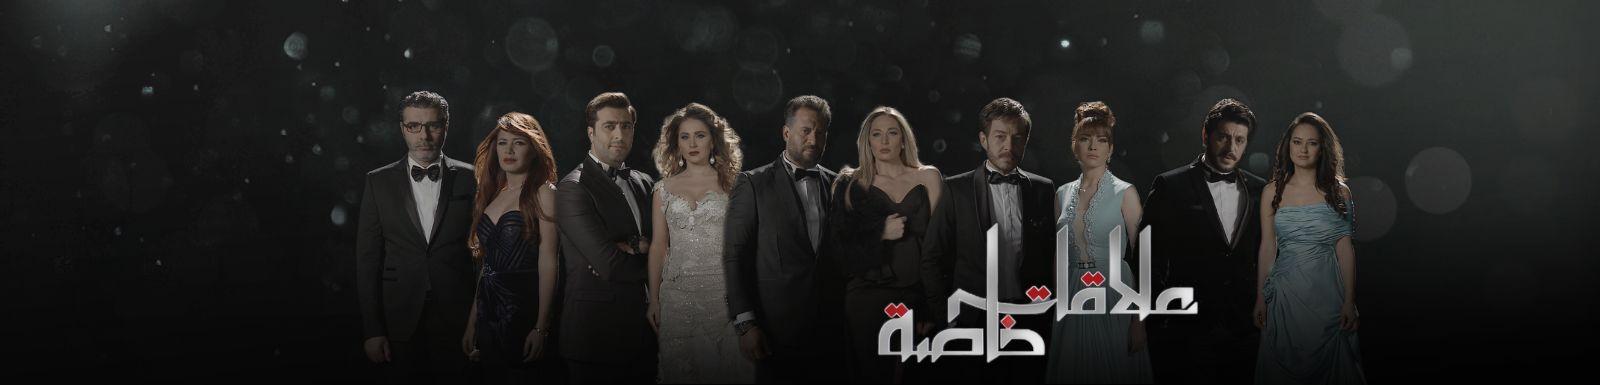 ����� ����� ������ ���� ������ 15 MBC shahid ���� ��